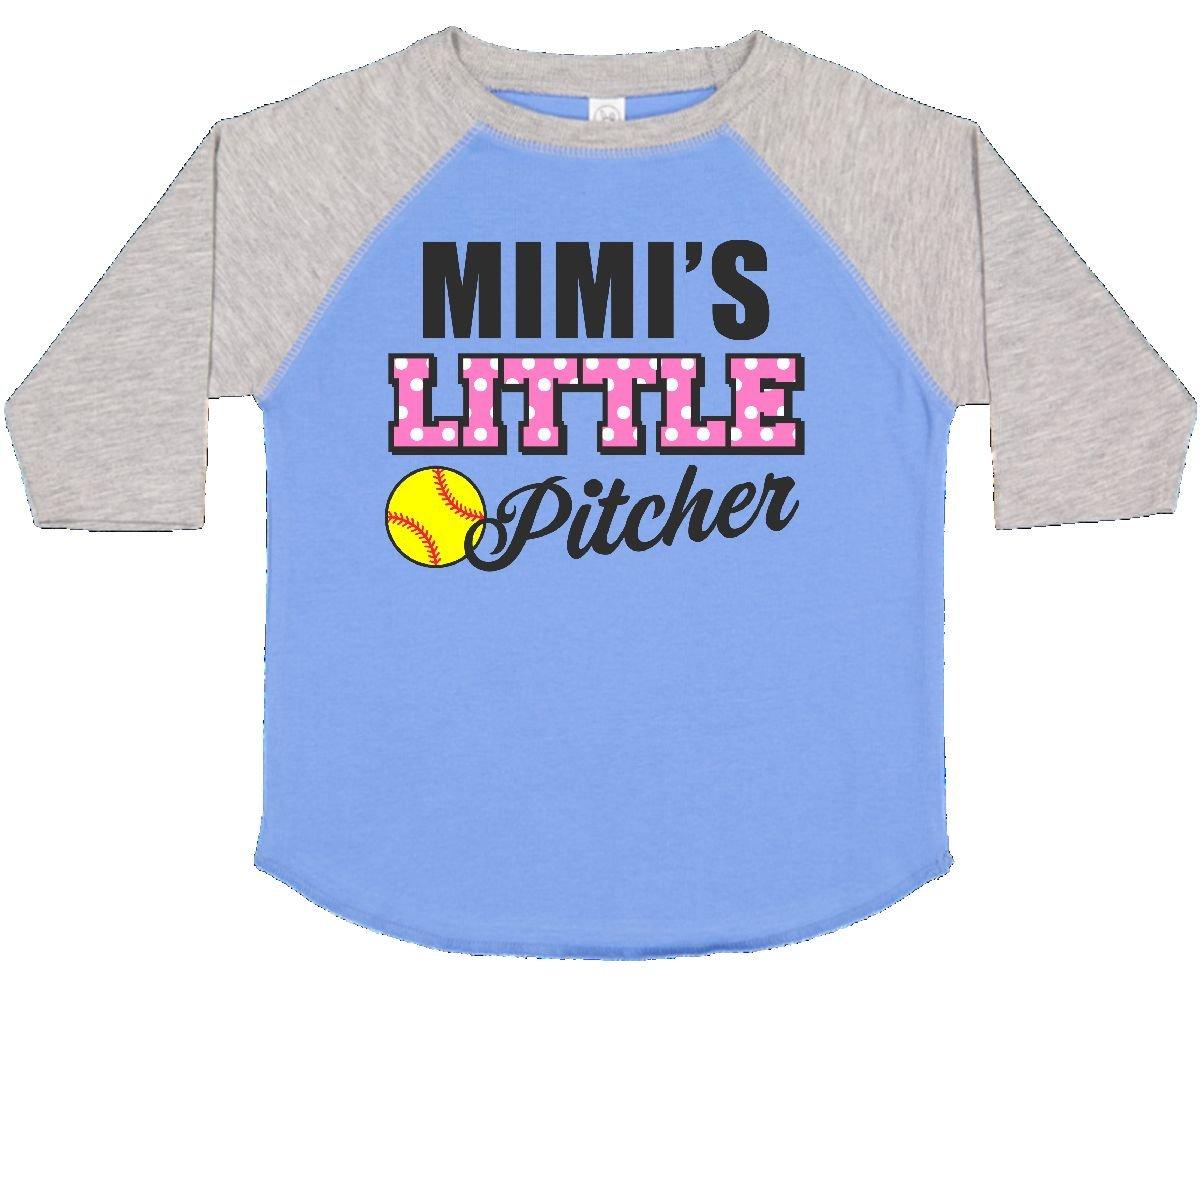 inktastic Mimis Little Pitcher Softball Toddler T-Shirt